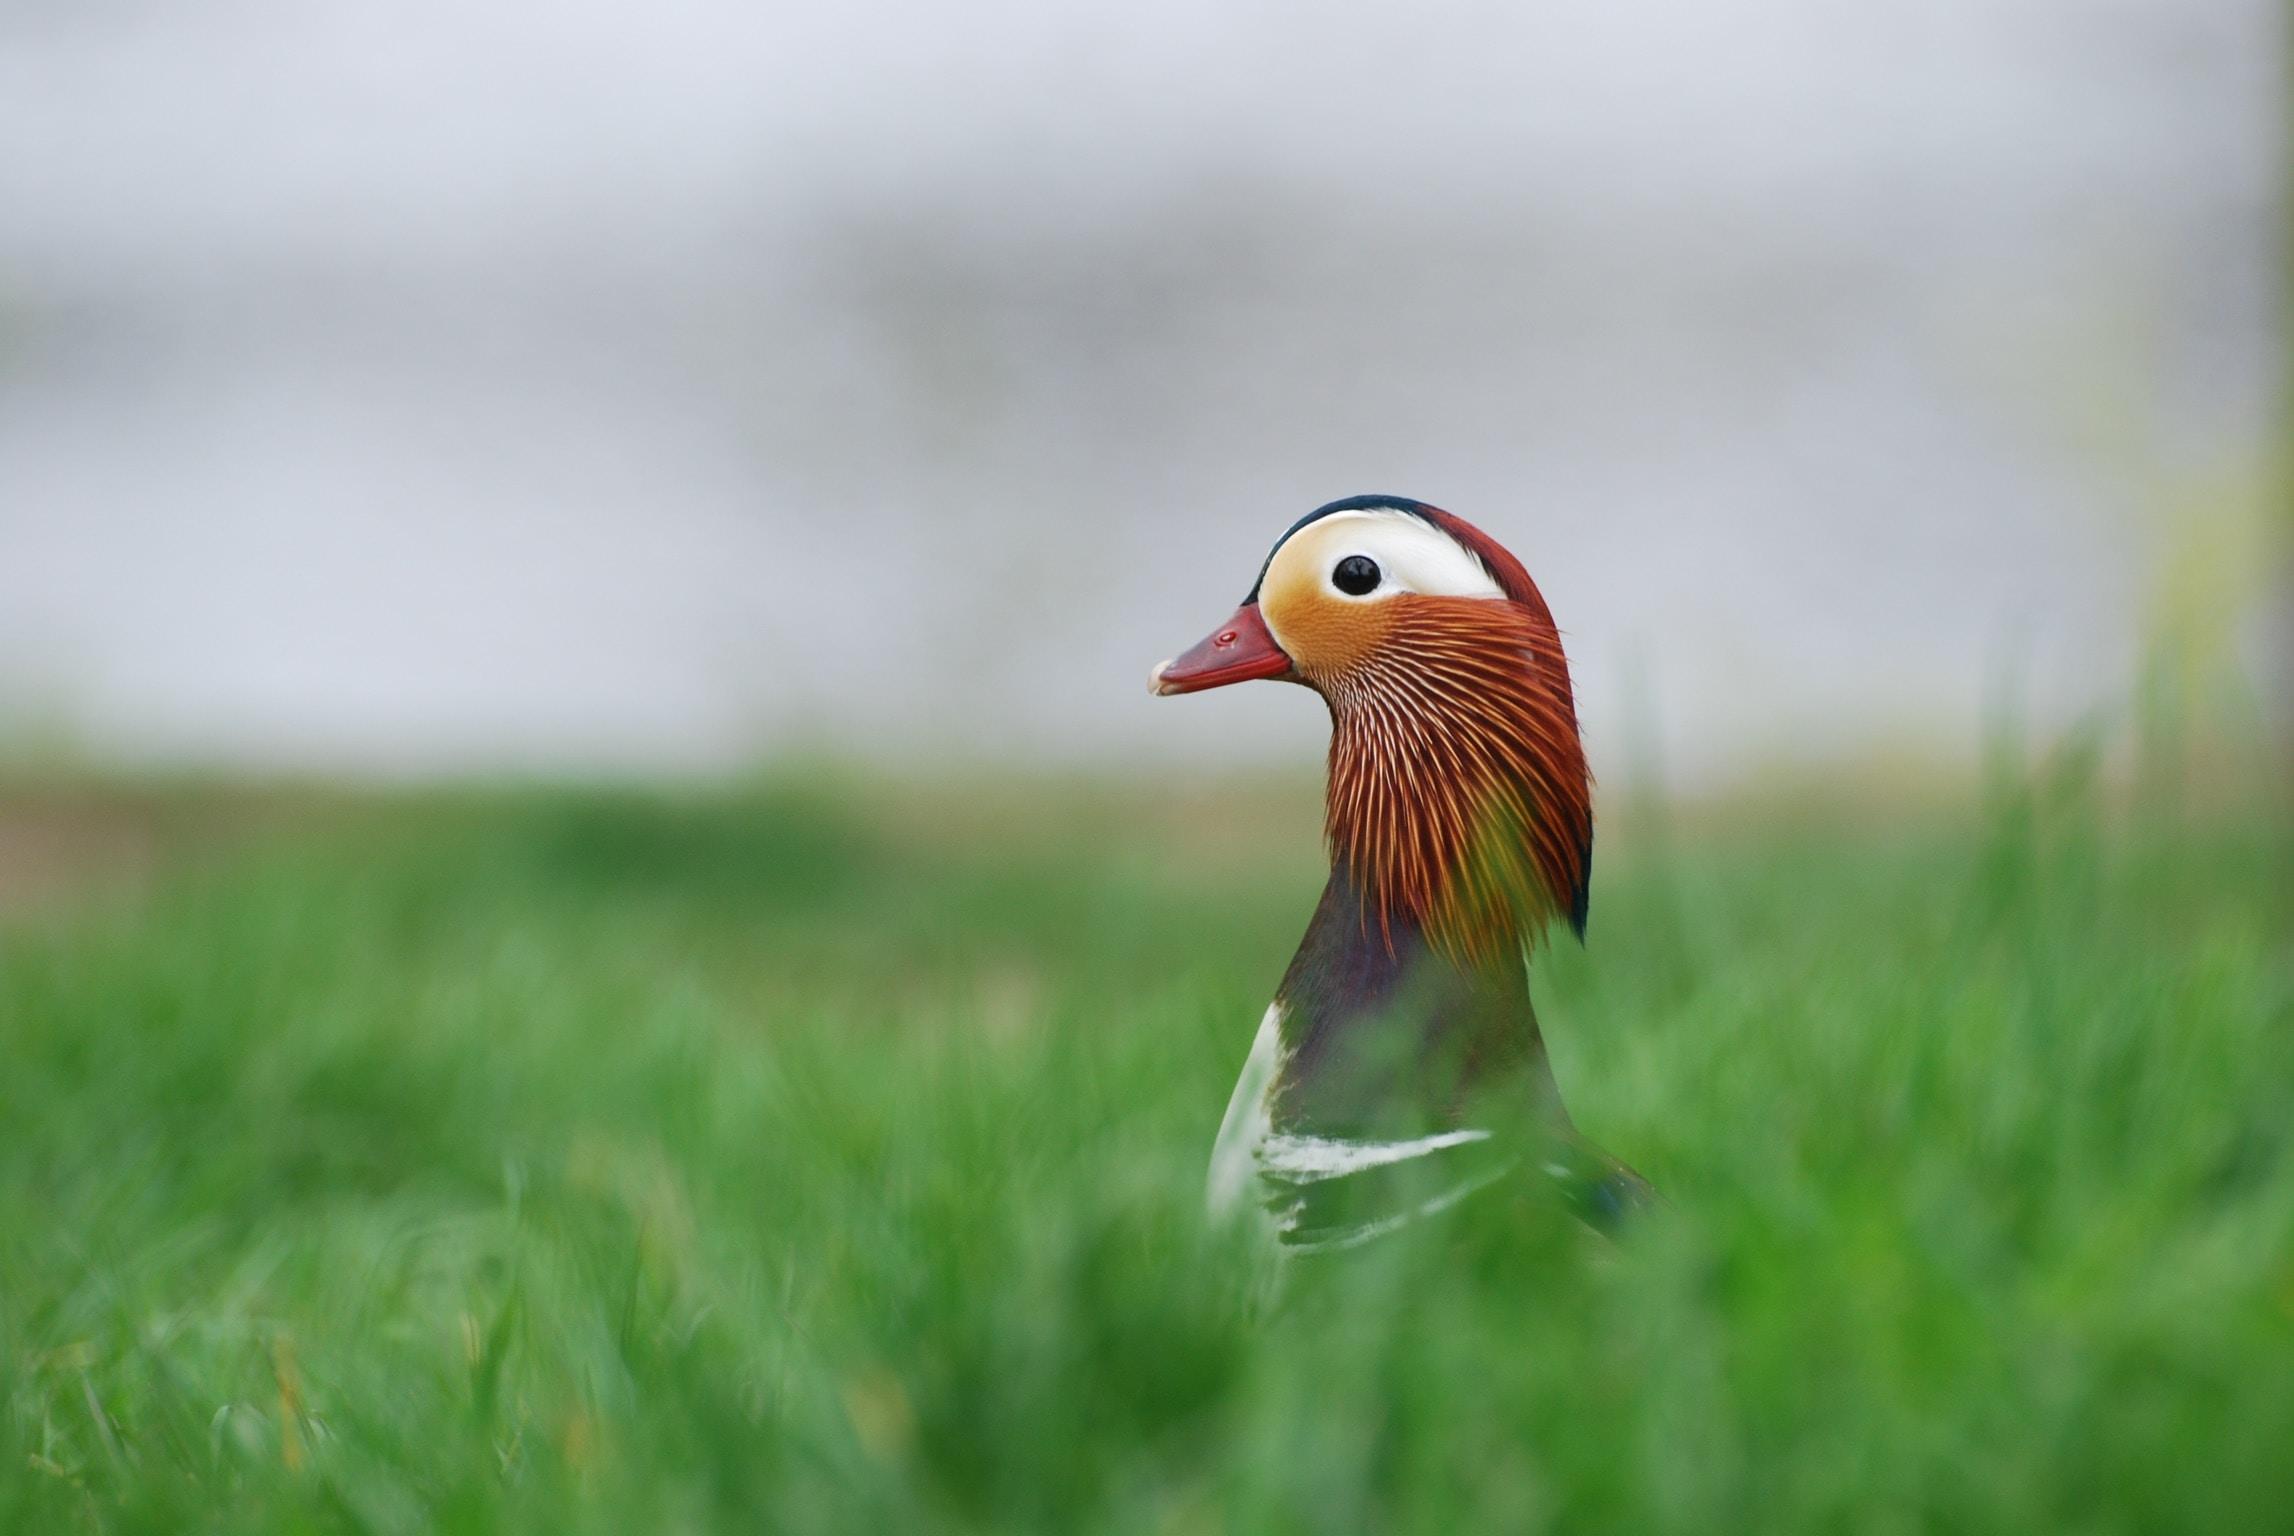 white, brown, and orange bird